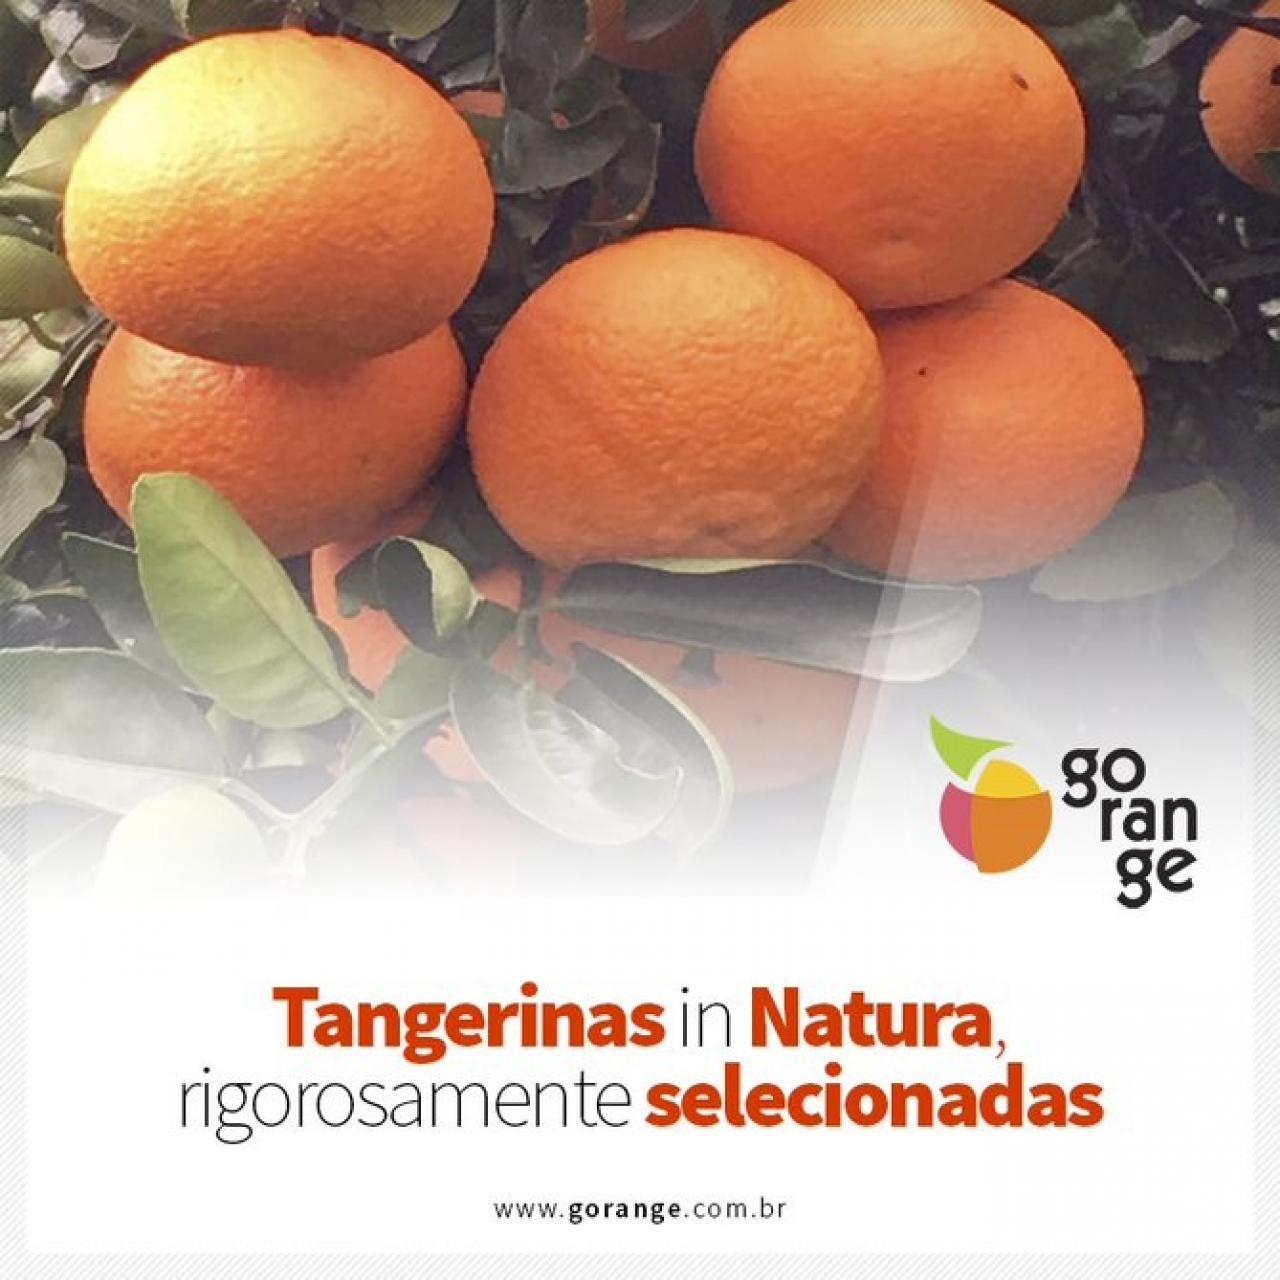 Tangerinas in Natura